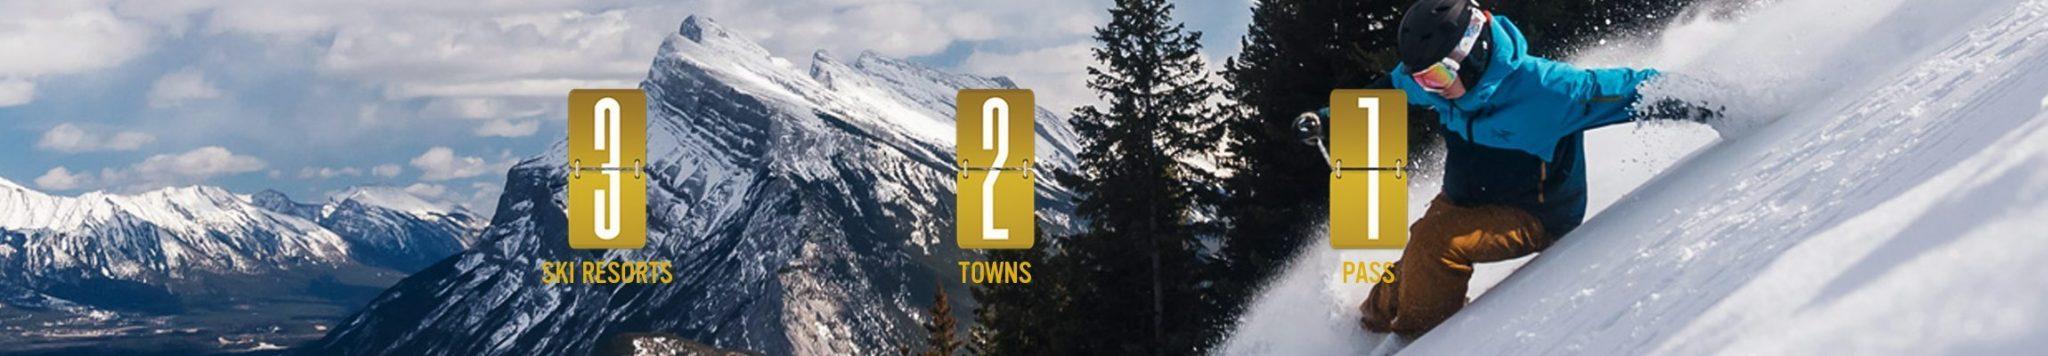 3 Resorts 2 Towns 1 Pass